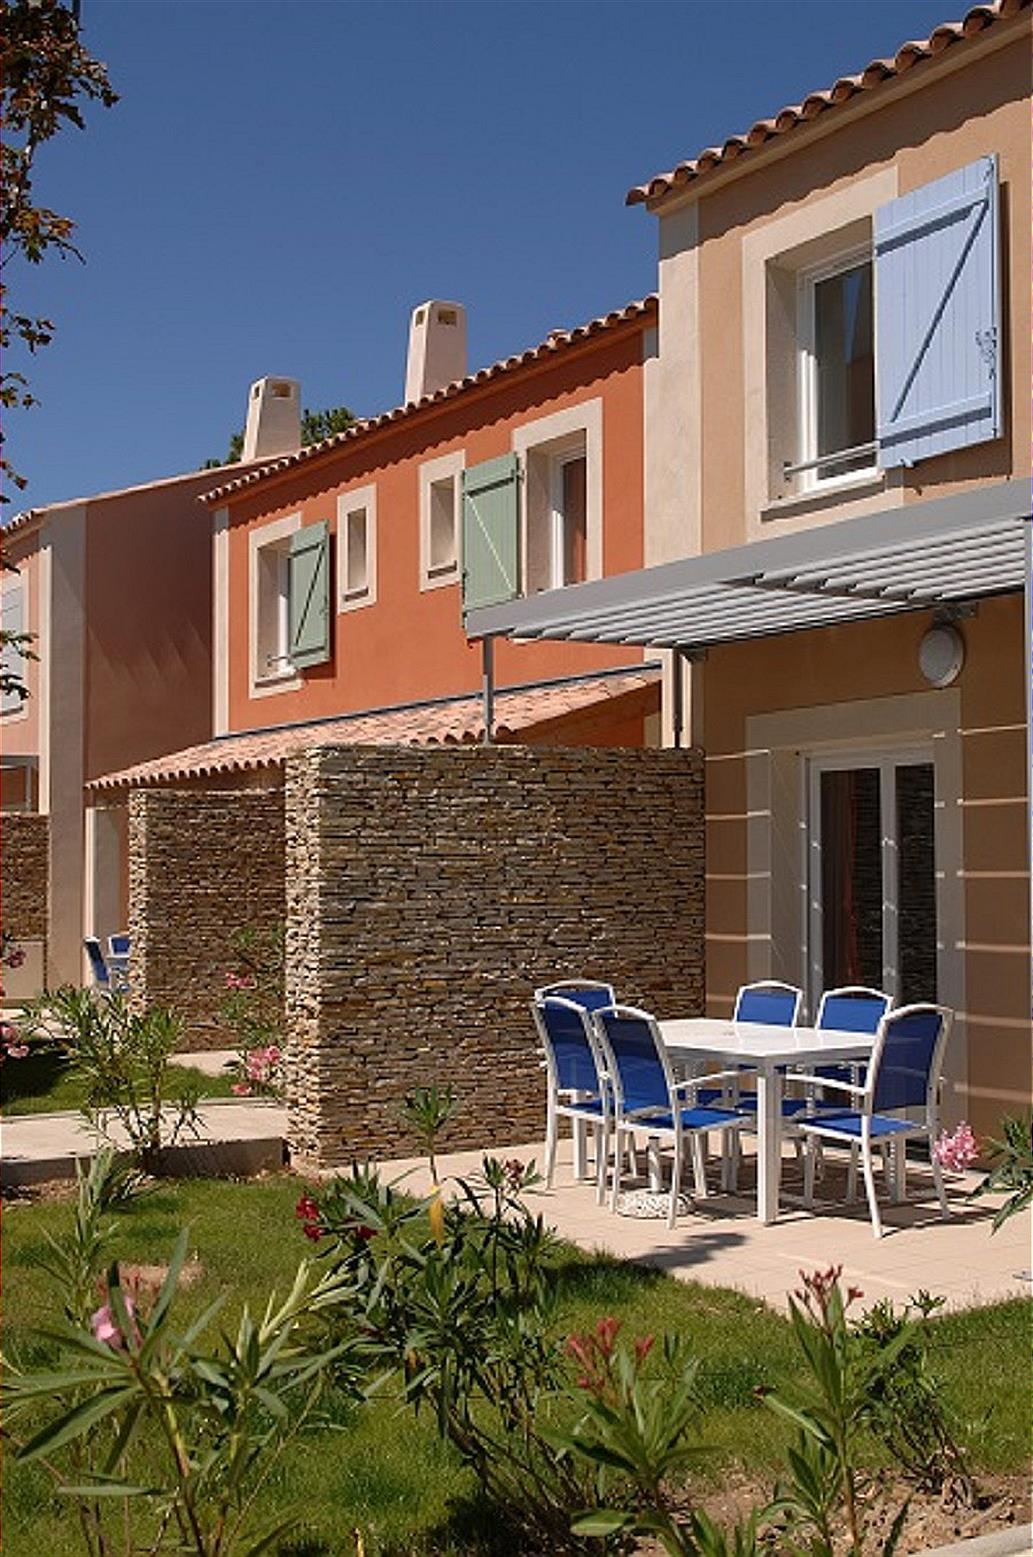 Ferienwohnung Aigues Mortes 3p 6 (1064043), Aigues Mortes, Mittelmeerküste Gard, Languedoc-Roussillon, Frankreich, Bild 6